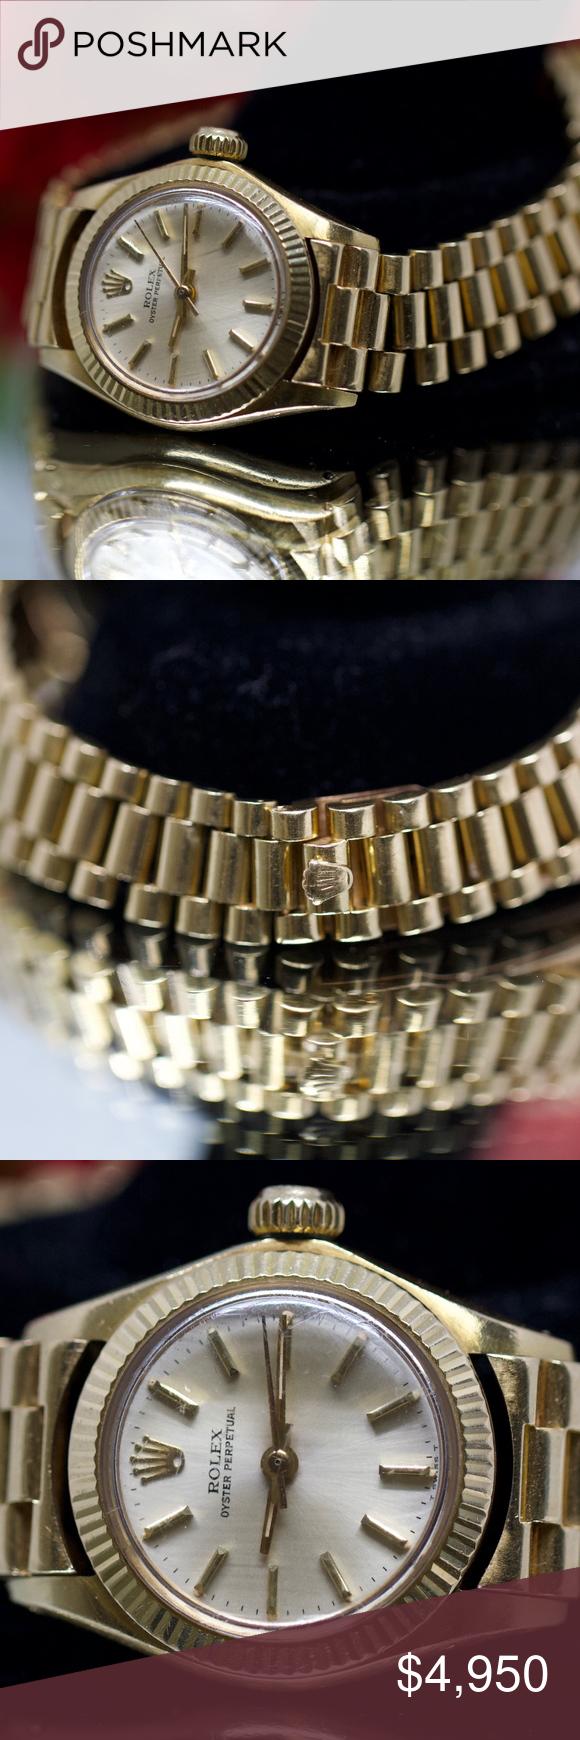 Rolex Ladies Datejust President 18k Gold 26mm Rolex Ladies Datejust President 18k Gold 26mm Papers Included Rolex Accessories Watc Rolex Bracelet Box 18k Gold